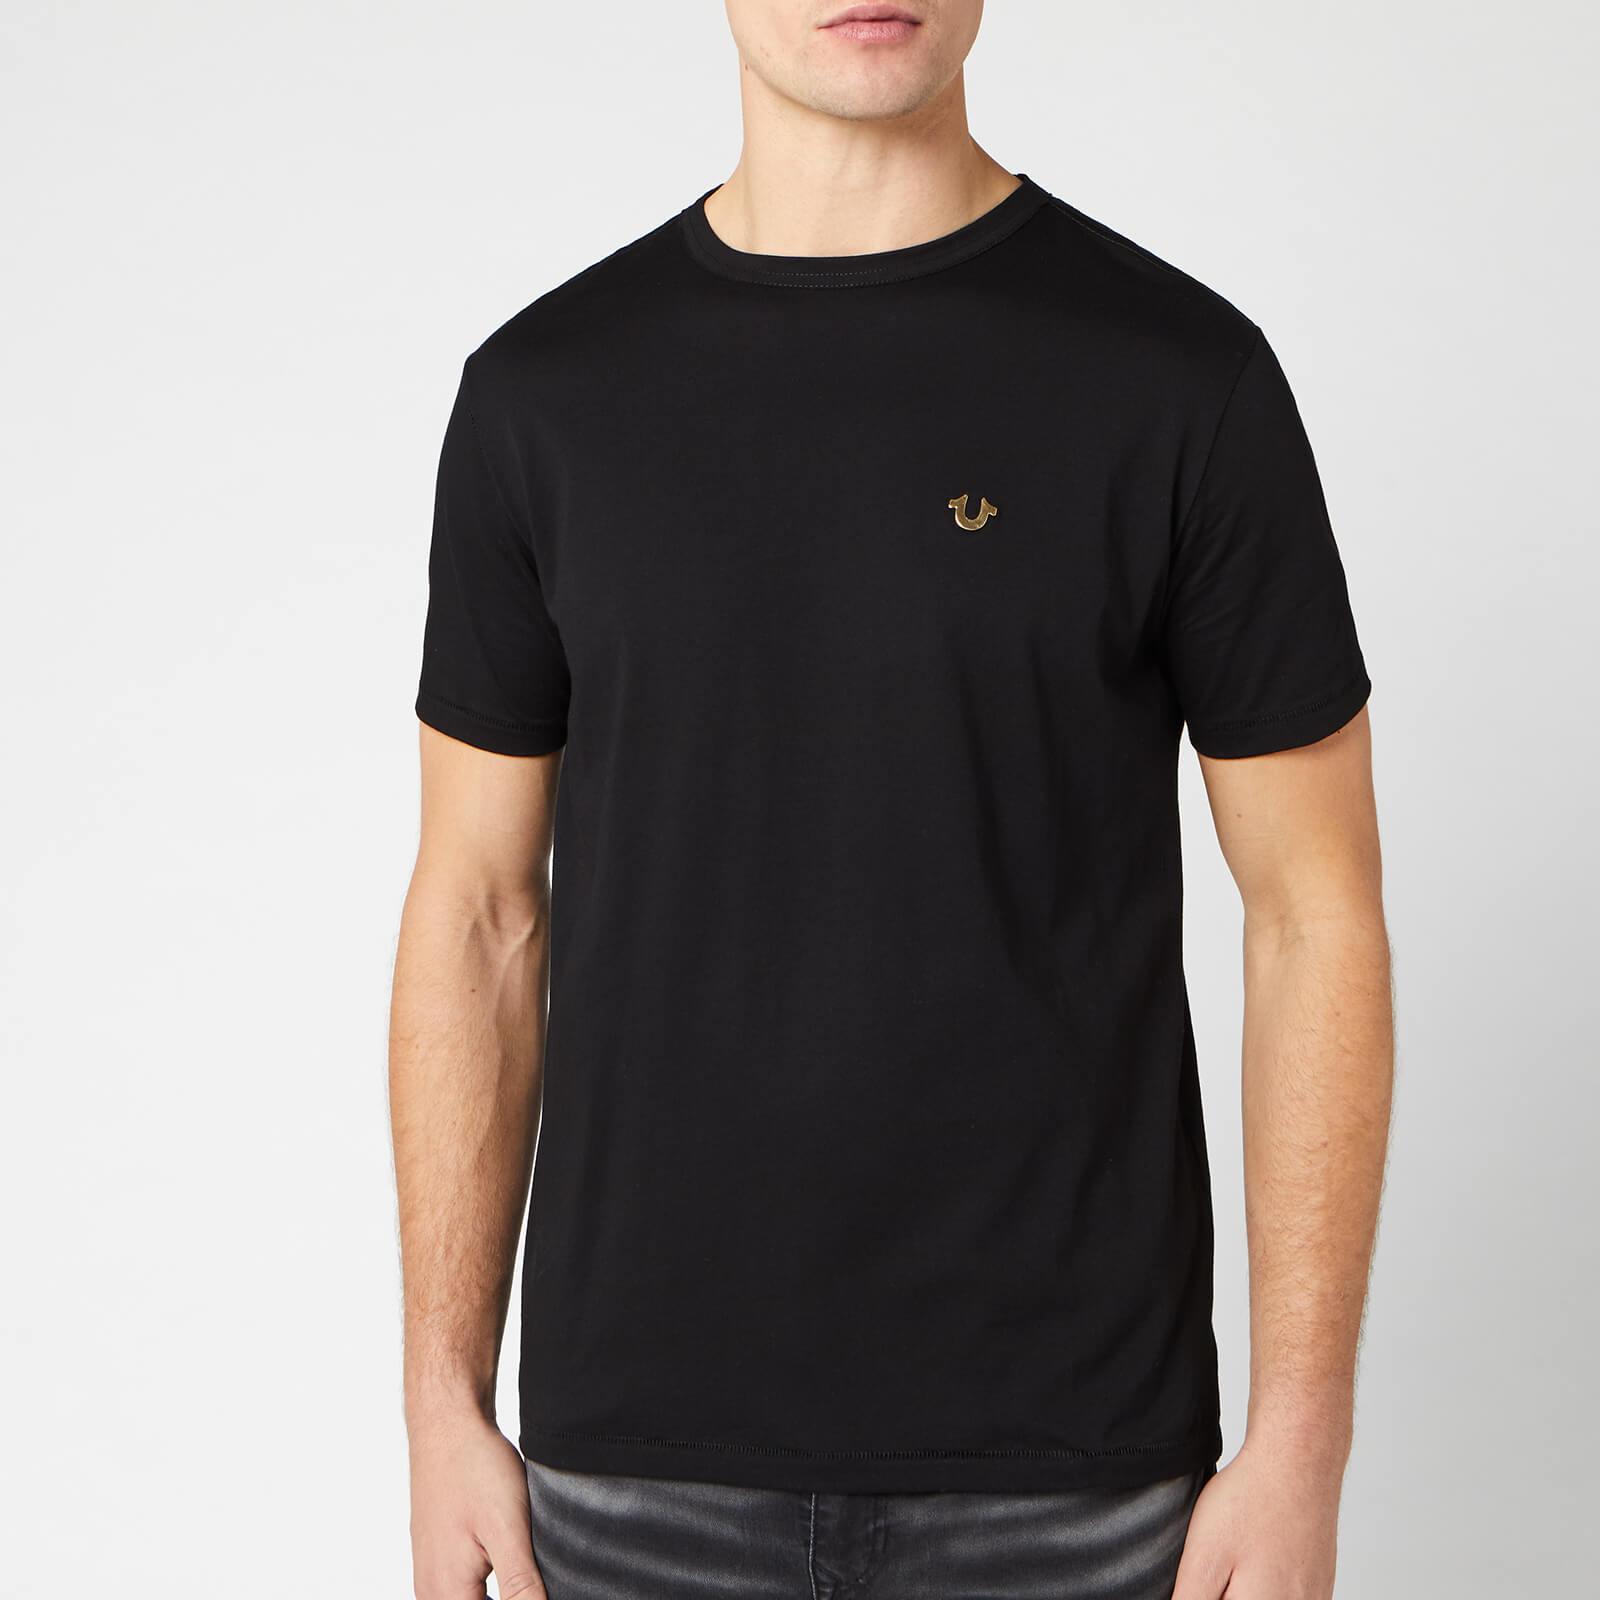 True Religion Men's Metal Horseshoe Crew T-Shirt - Black - L